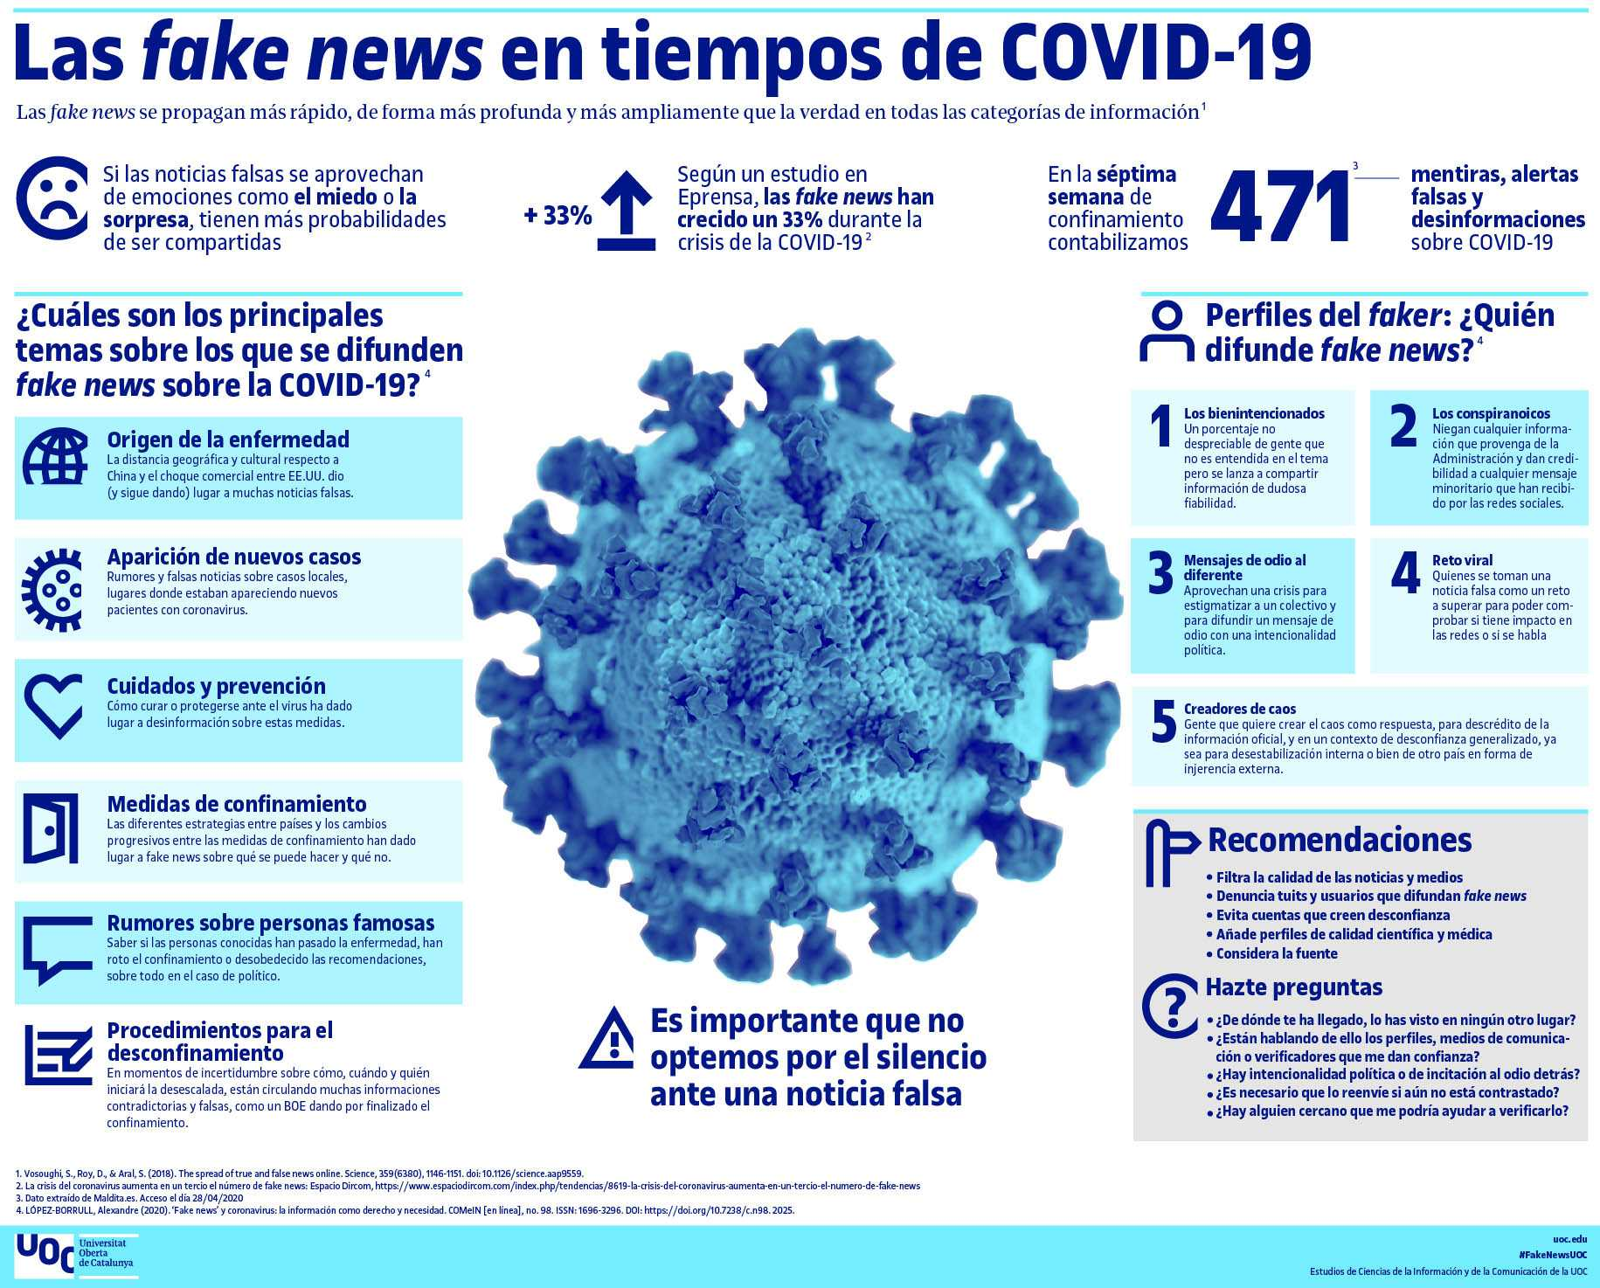 Infografia fake news